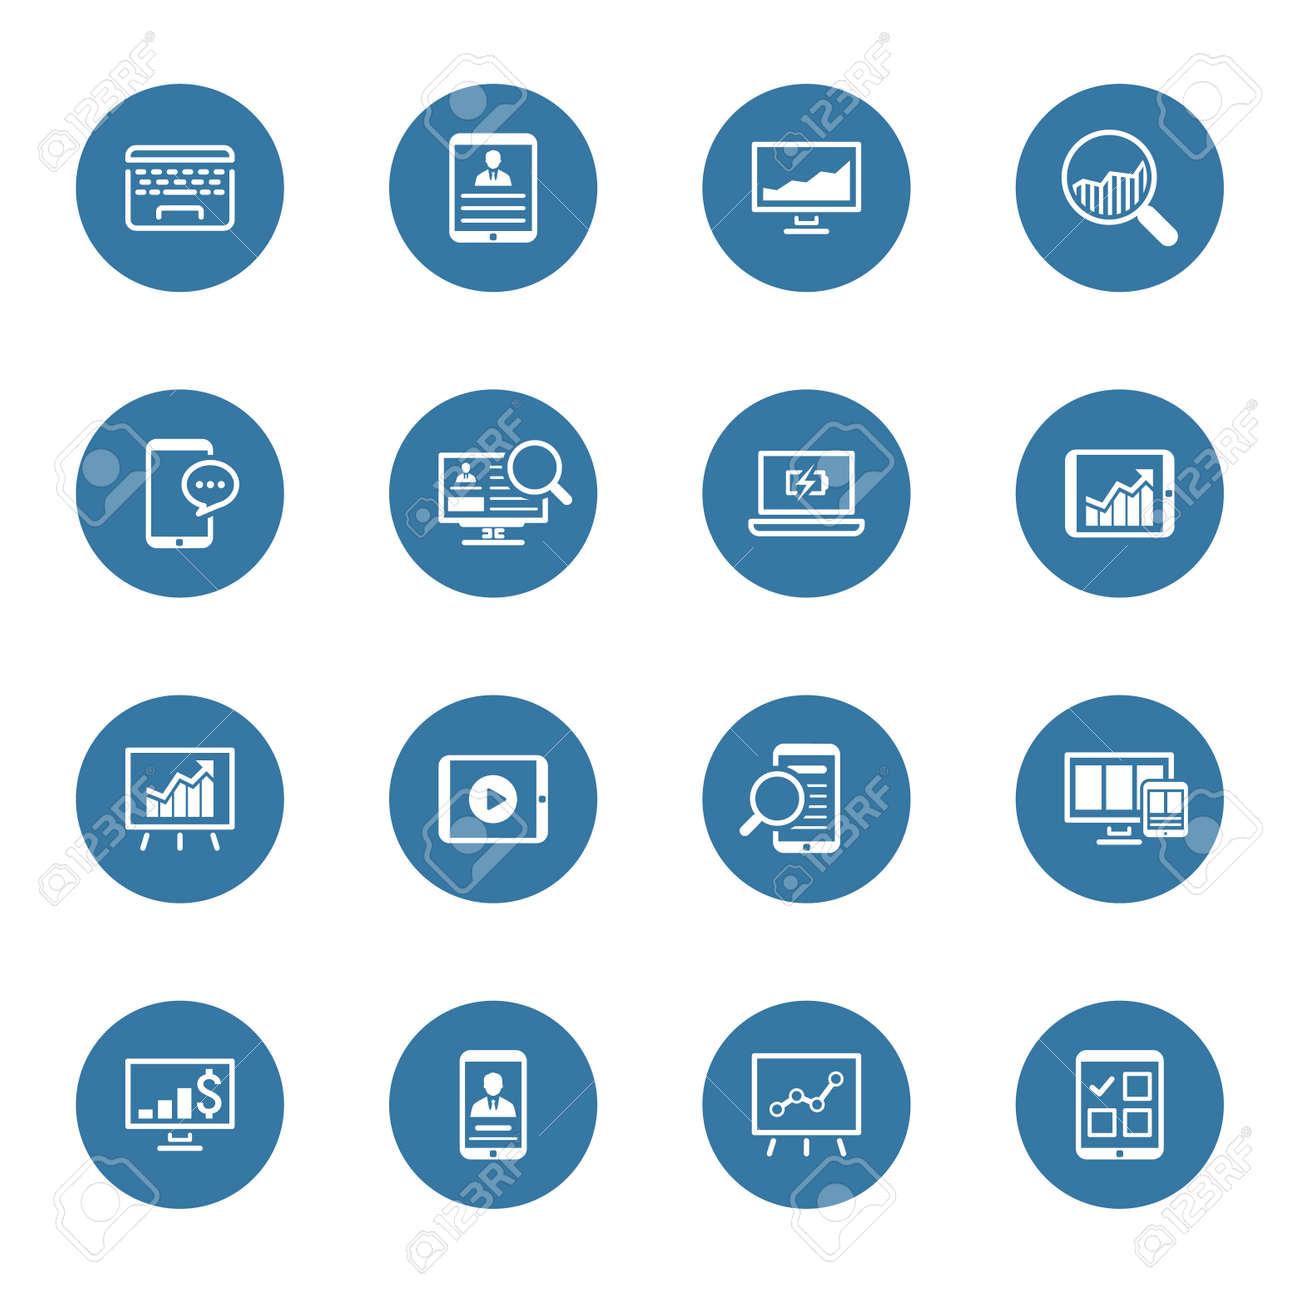 Business and Finances Icons Set. Flat Design. Isolated Illustration. - 45248697